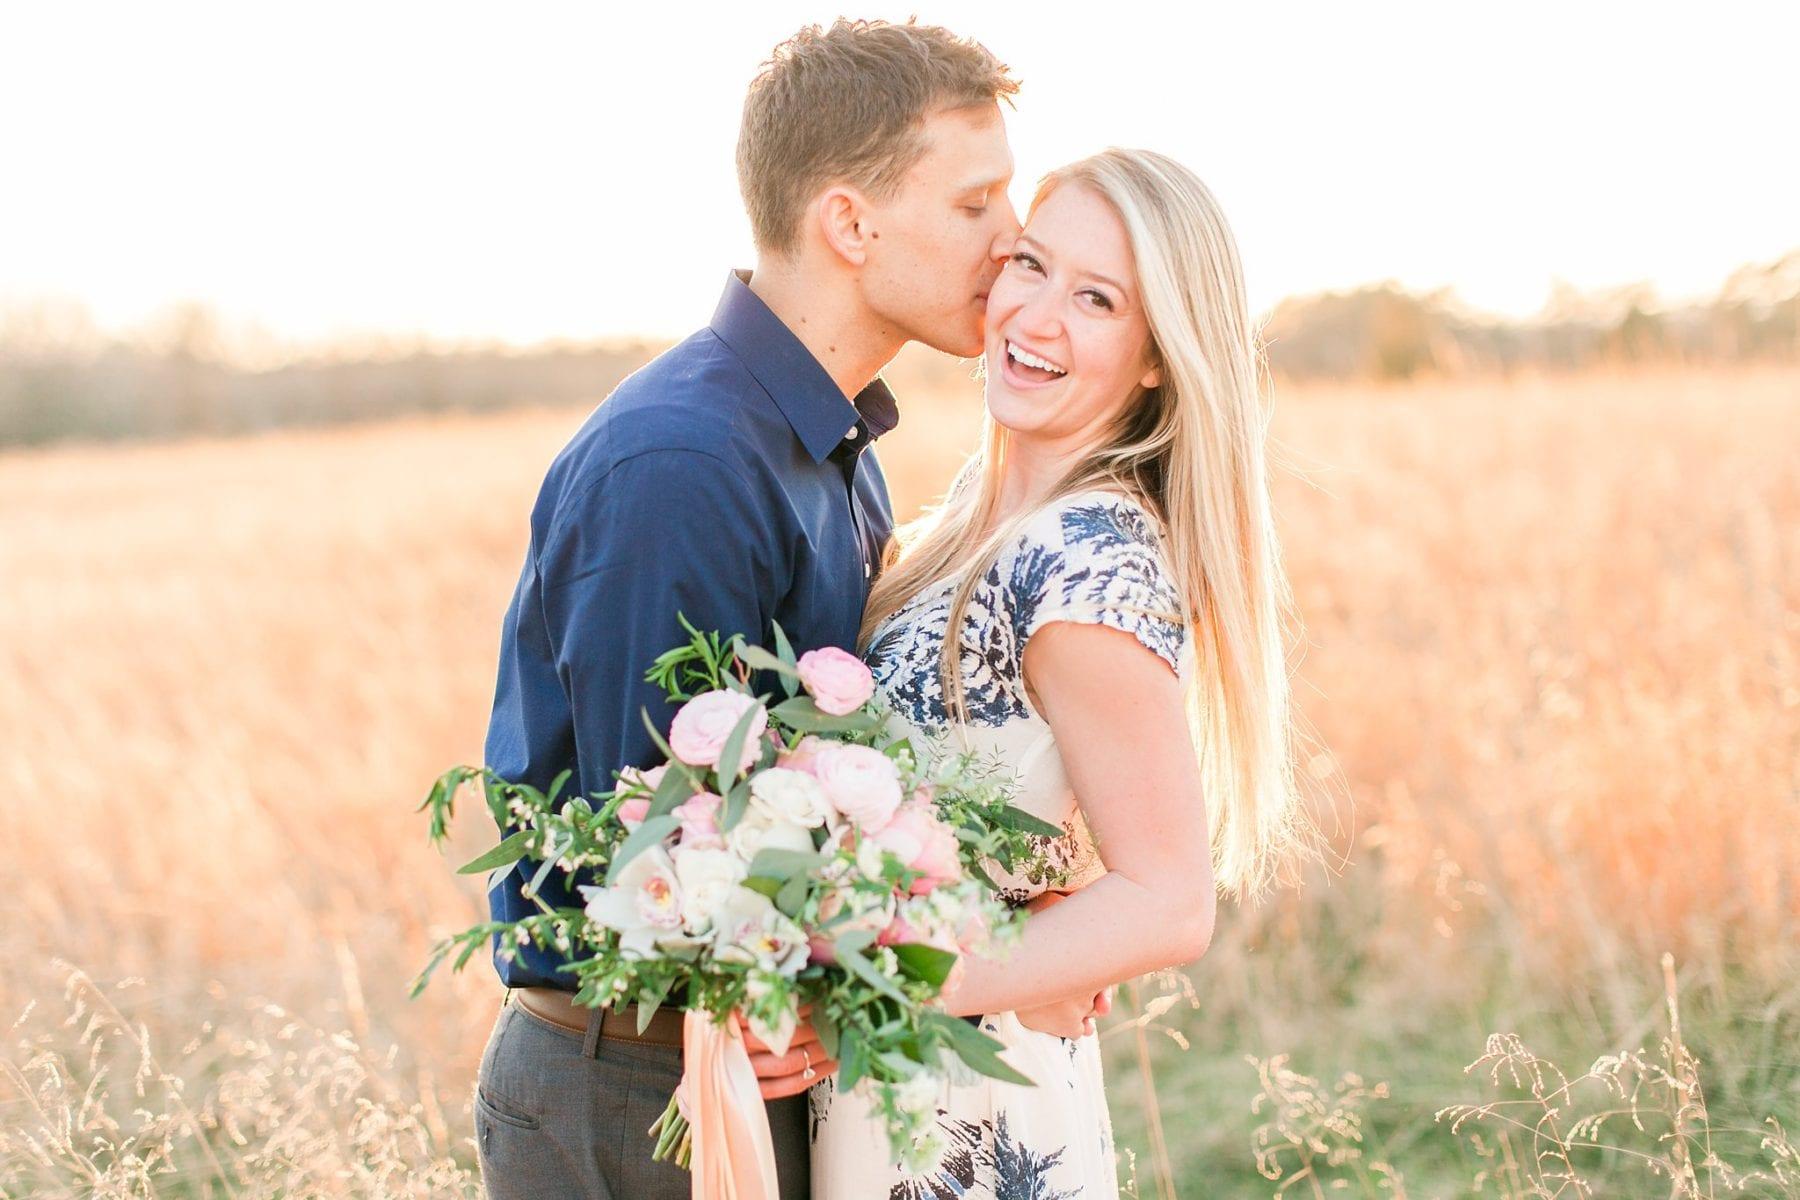 Manassas Battlefield Engagement Session Virginia Wedding Photographer Danielle & Charlie Megan Kelsey Photography-5948.jpg